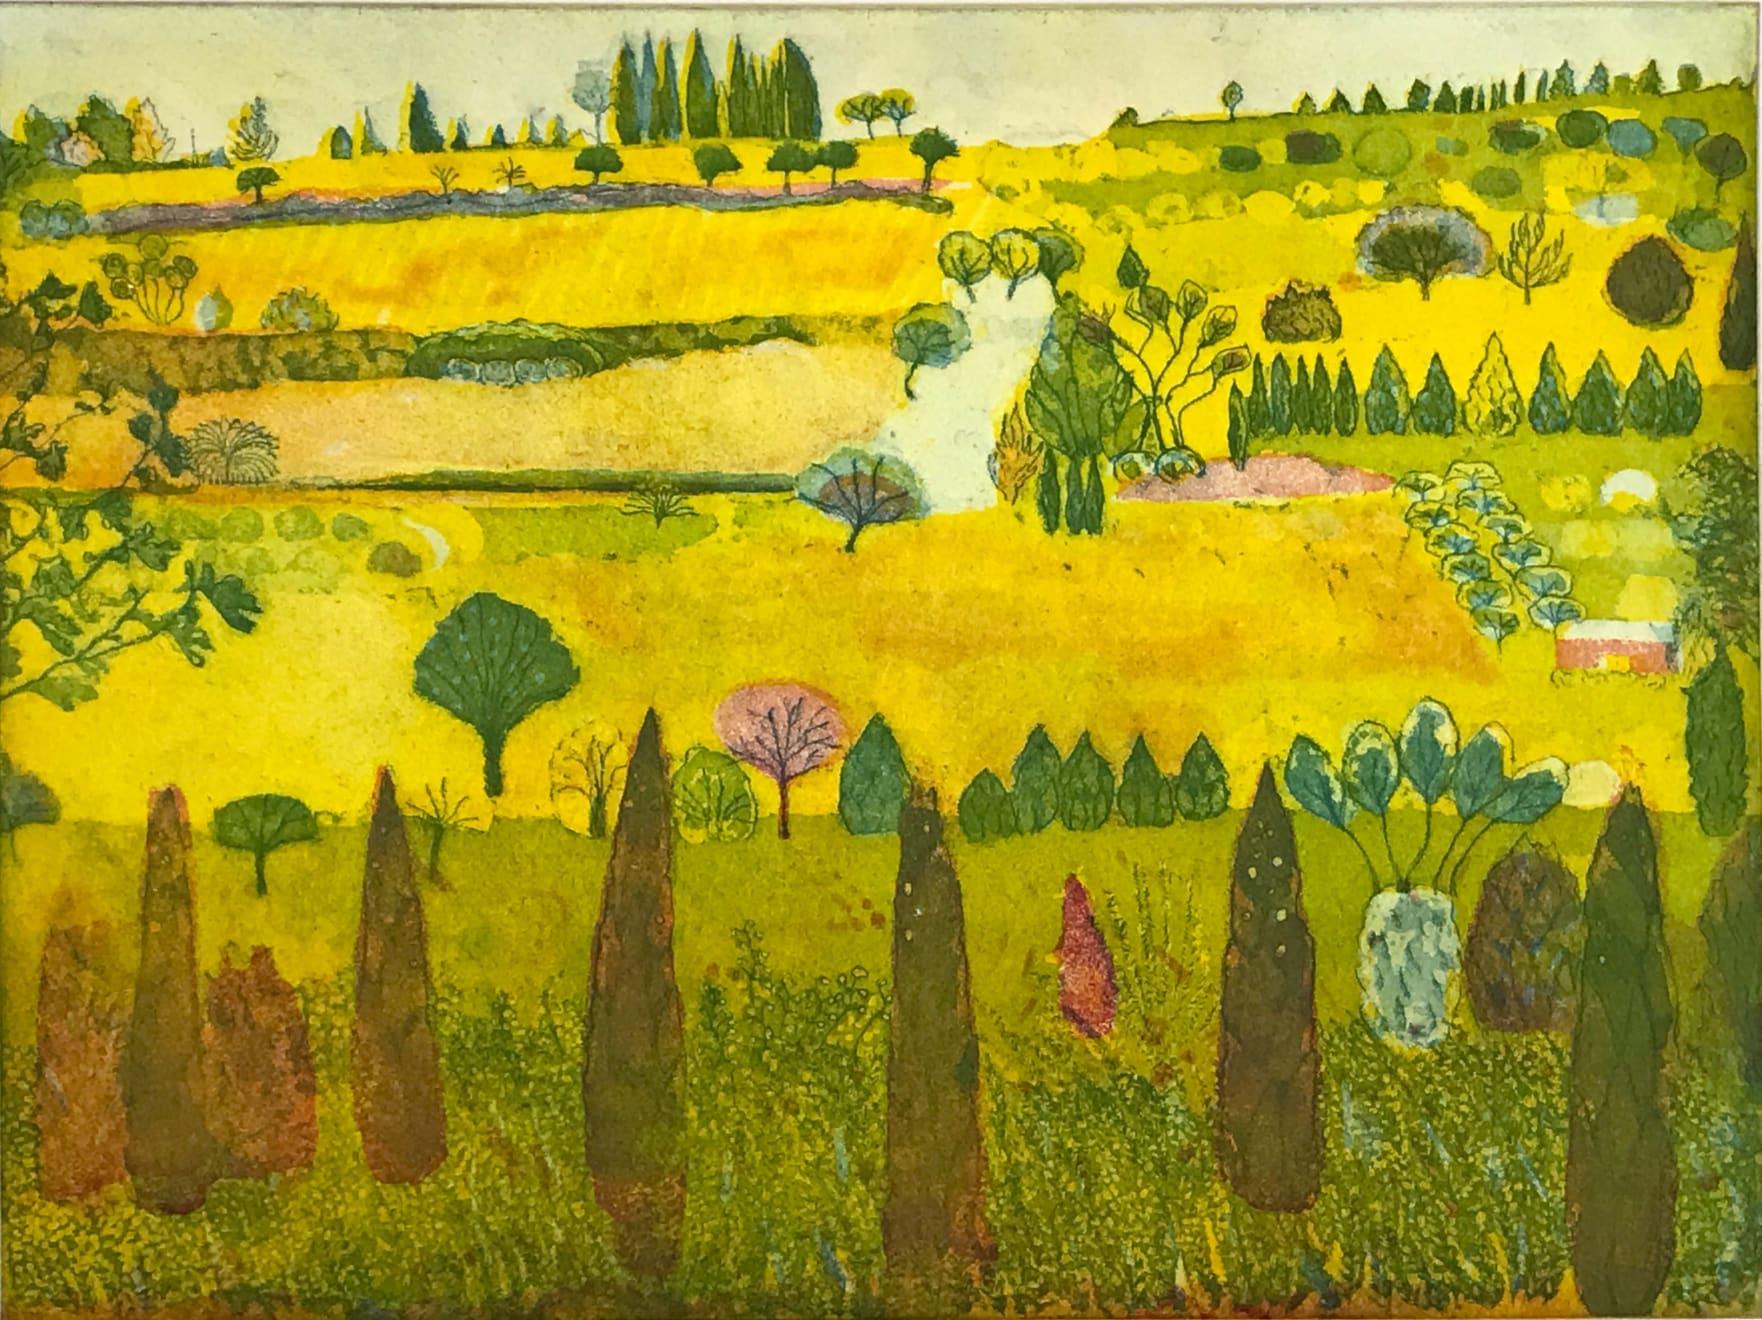 Karen Keogh, The Cypress Grove, 2013